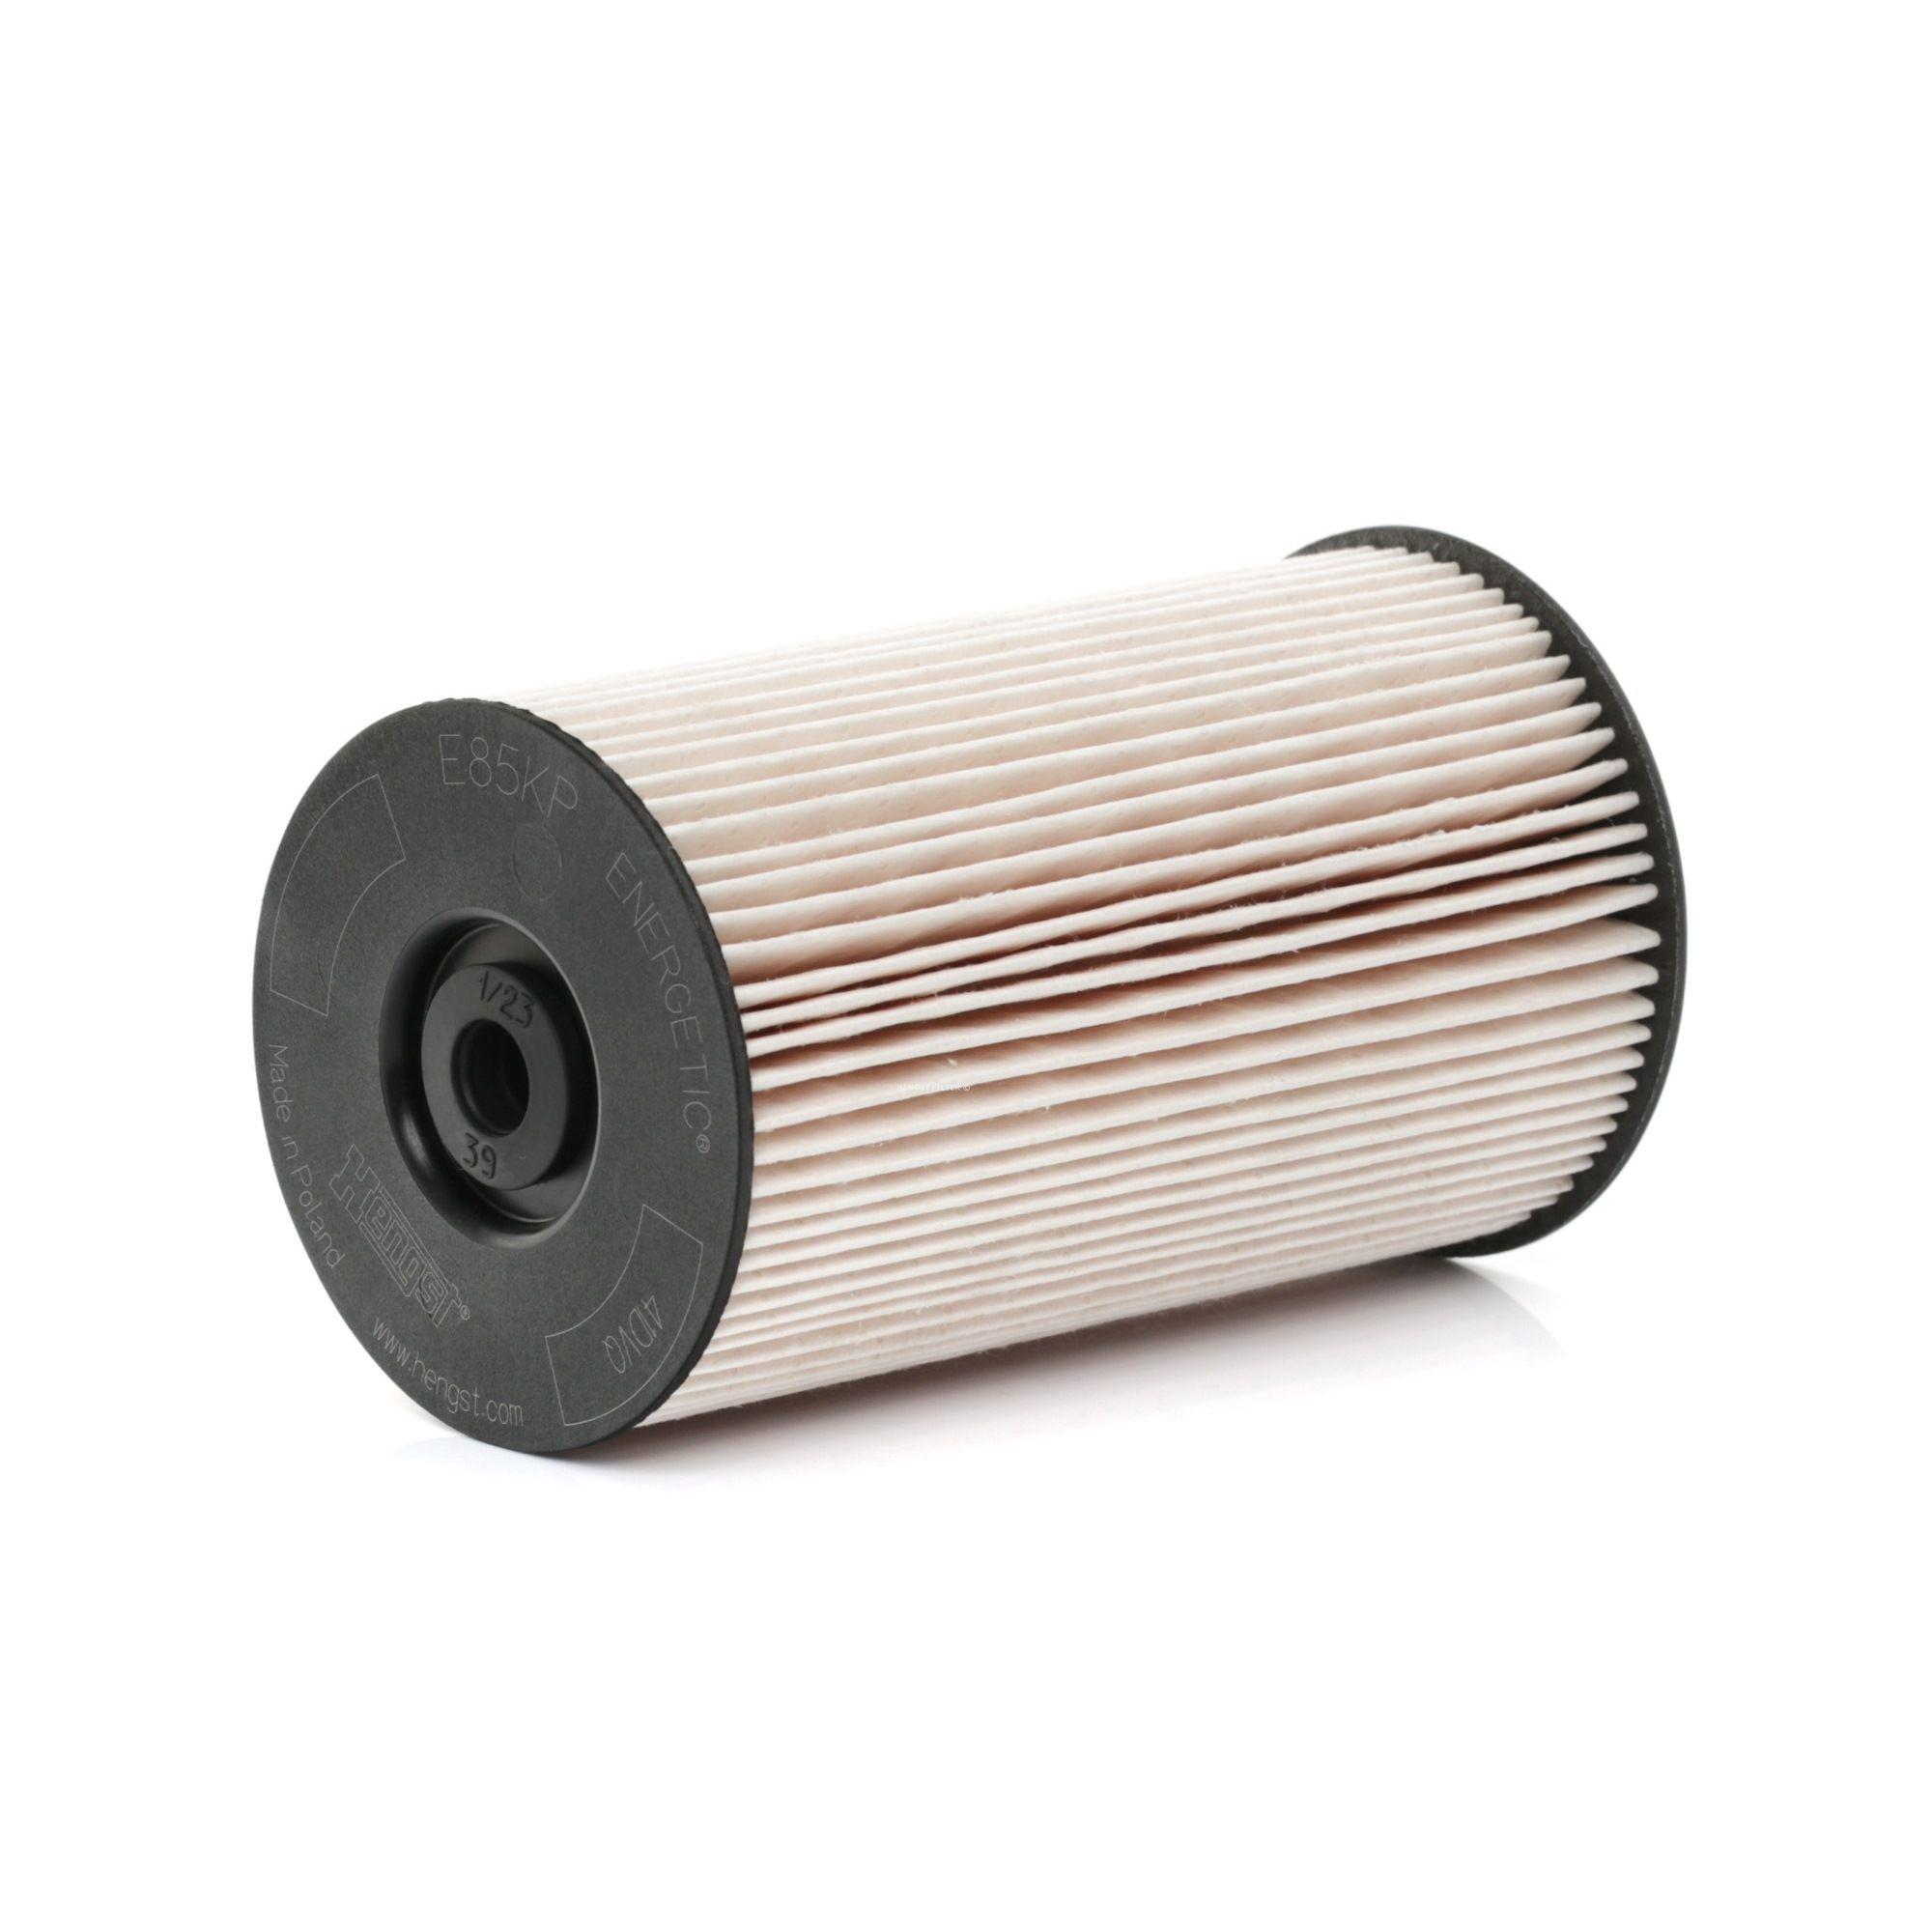 Palivový filtr E85KP D146 Skoda SUPERB 2013